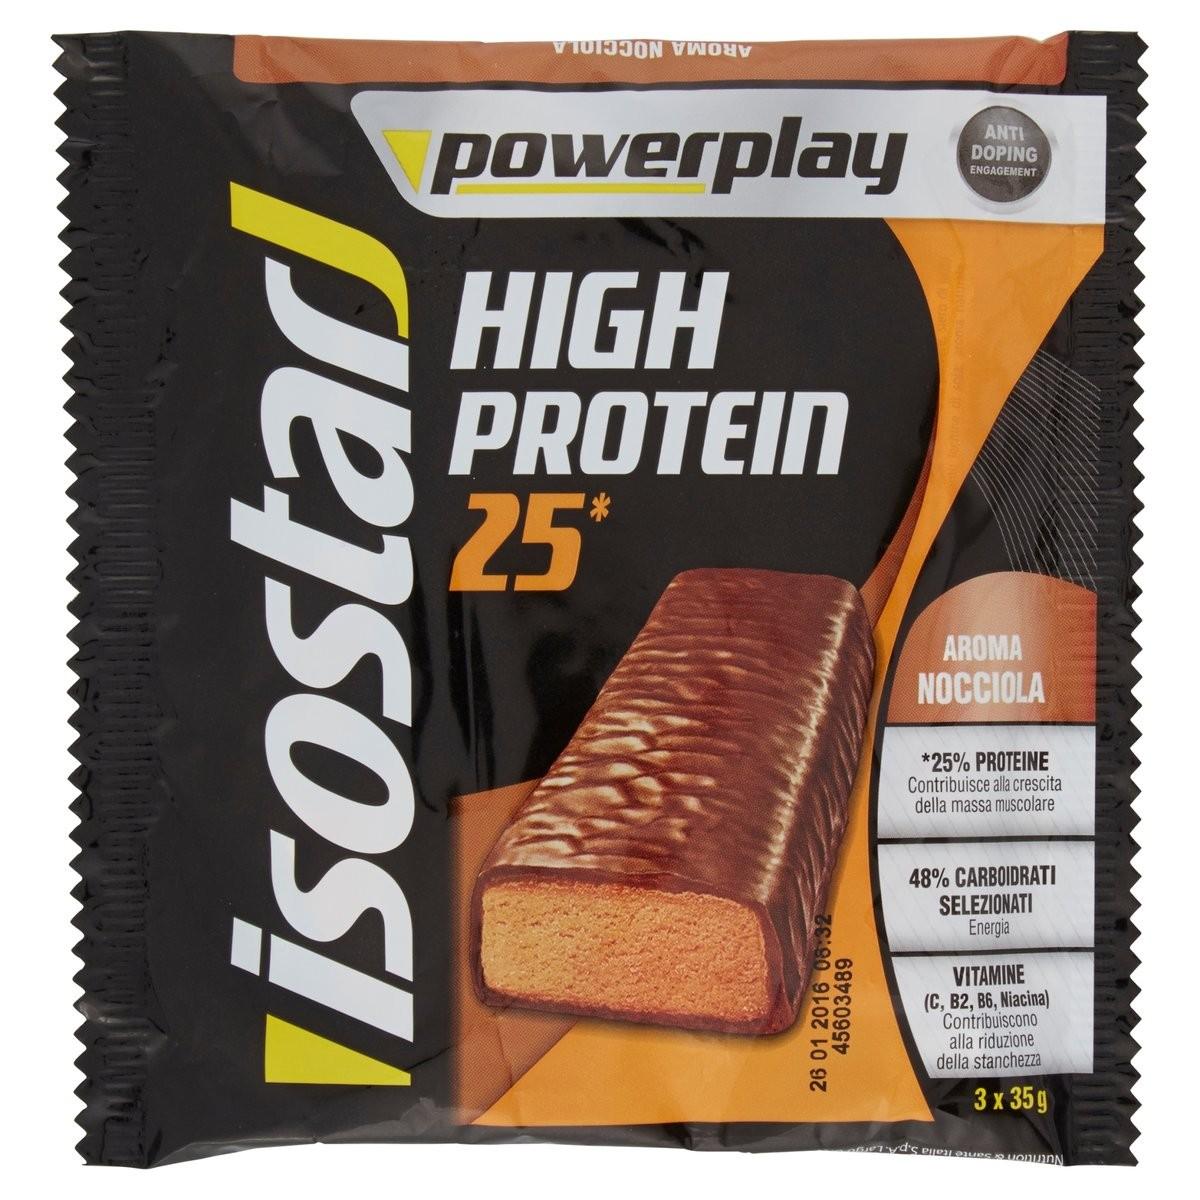 Barretta High Protein